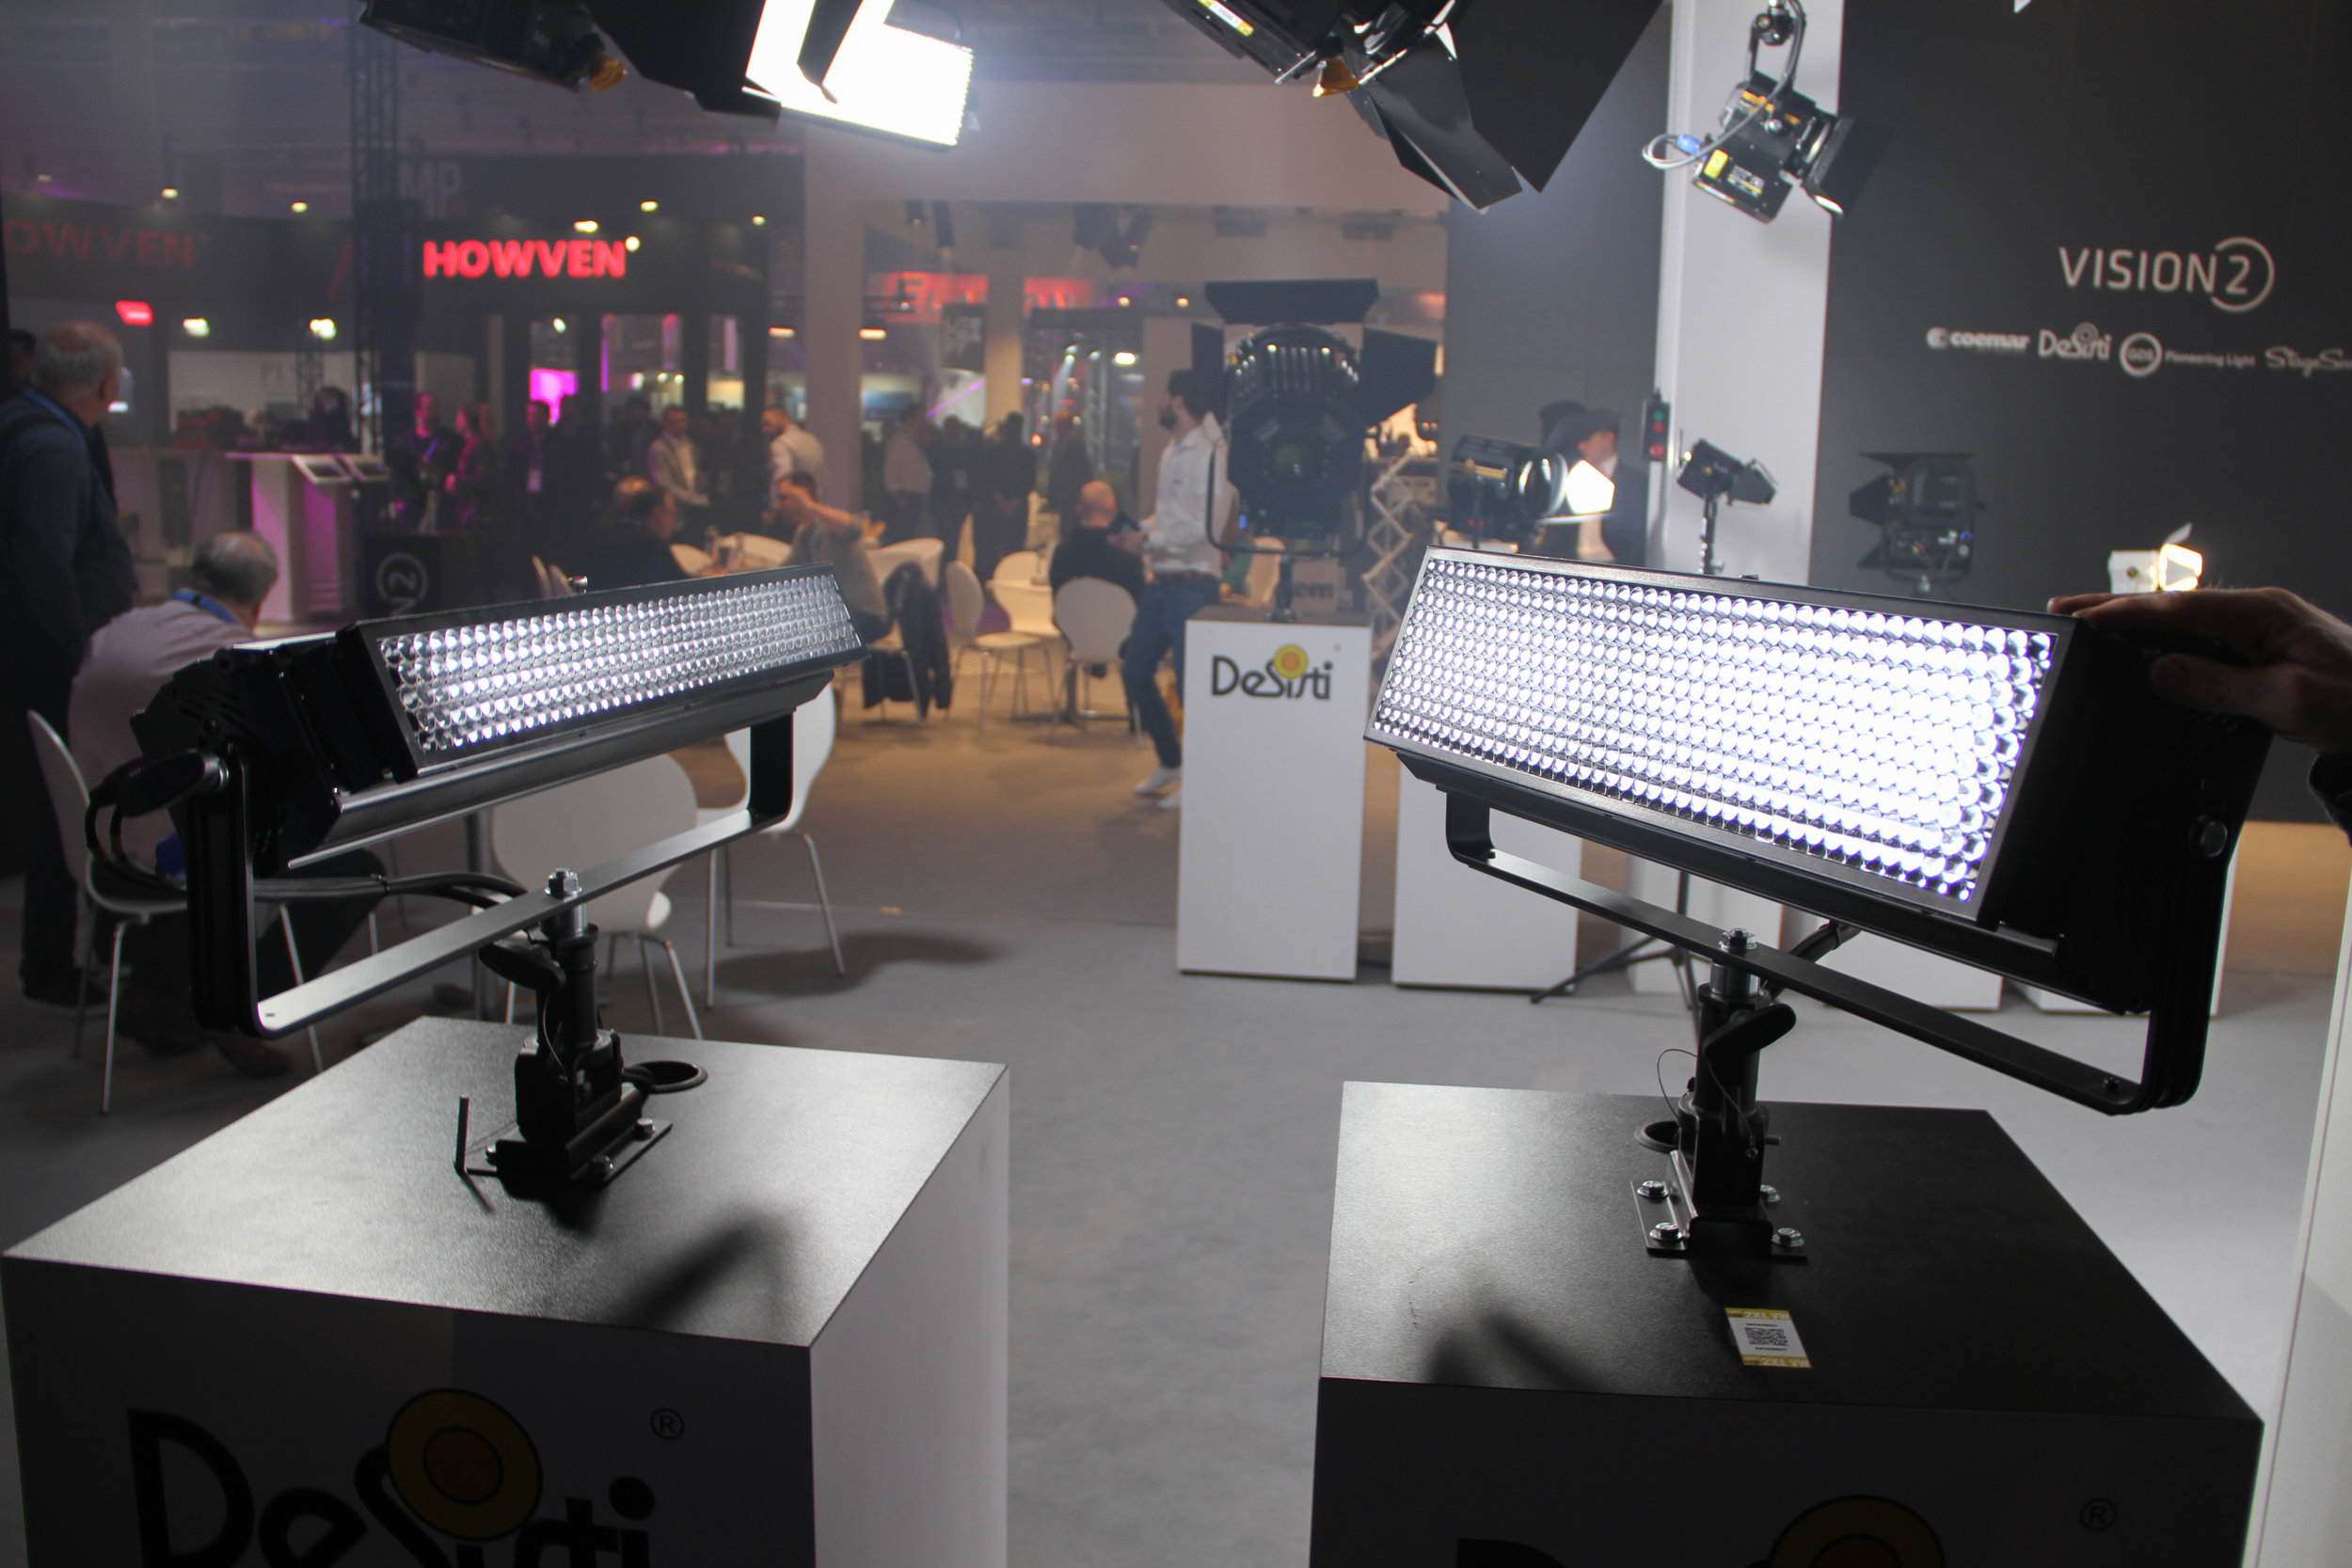 De Sisti erbjuder nu fler modeller till sin Soft LED-serie i form av 180-watts-modellen Soft LED 2XL.